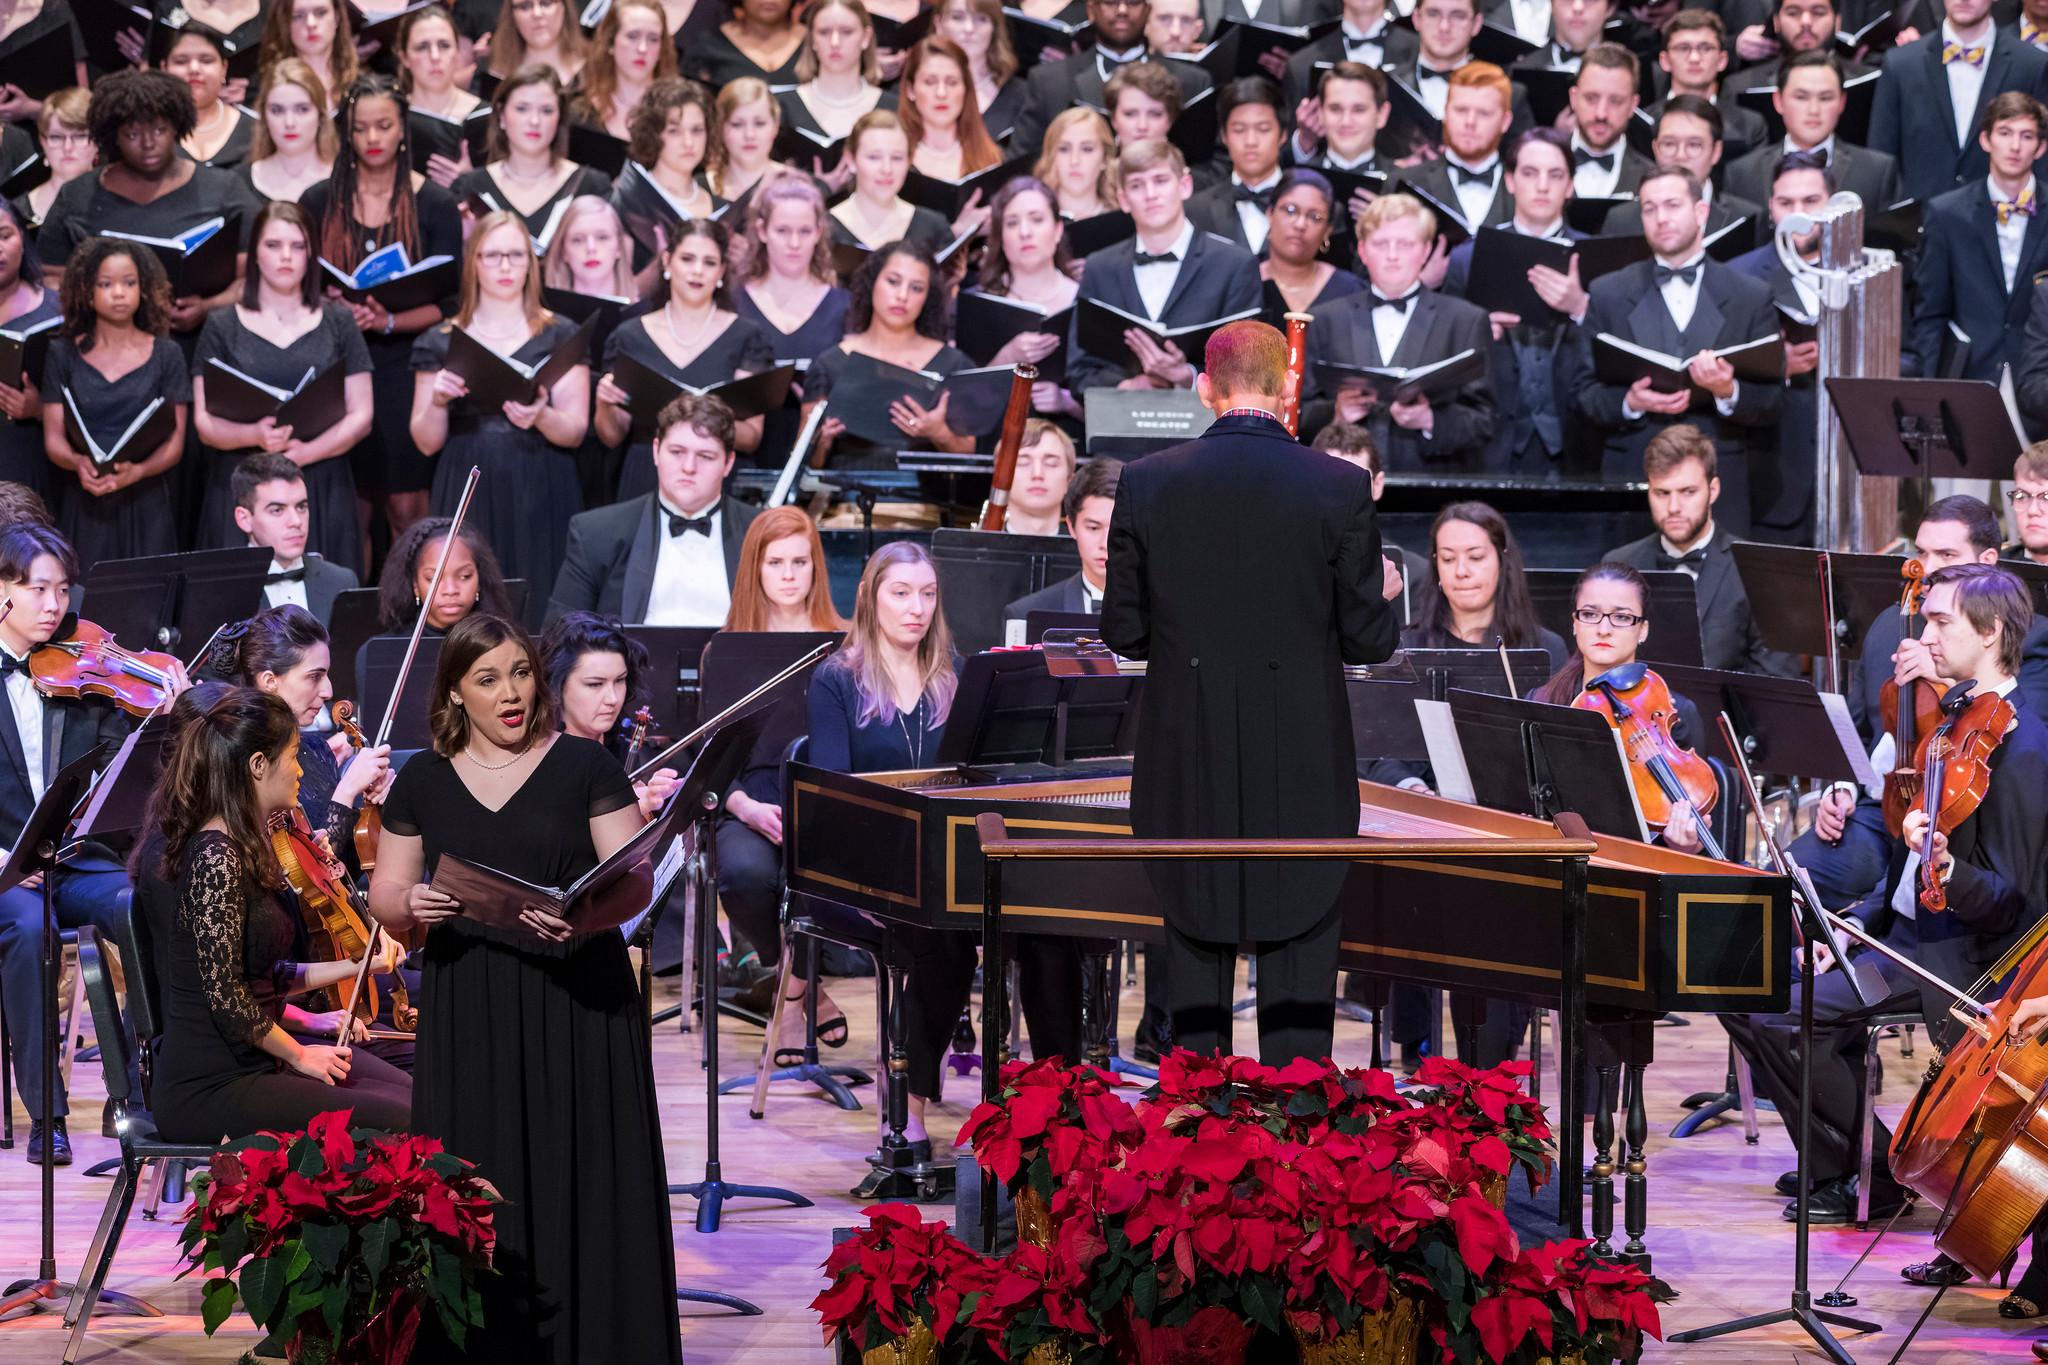 Soprano Soloist in  Handel's Messiah  Excerpt with LSU Symphony